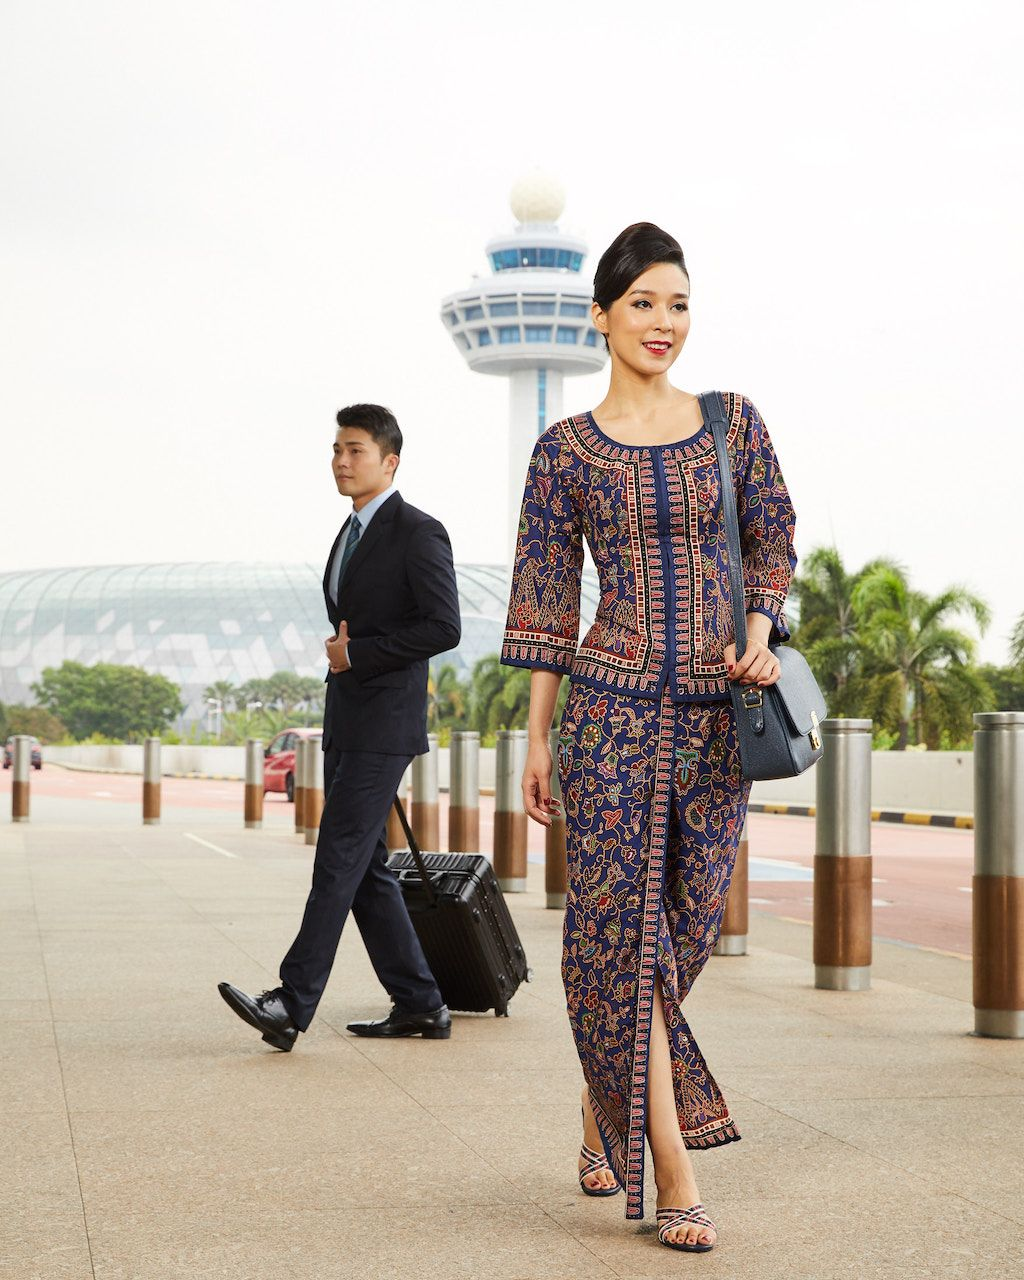 Singapore Airline Hiring Customer Service Staff (IT Jobs